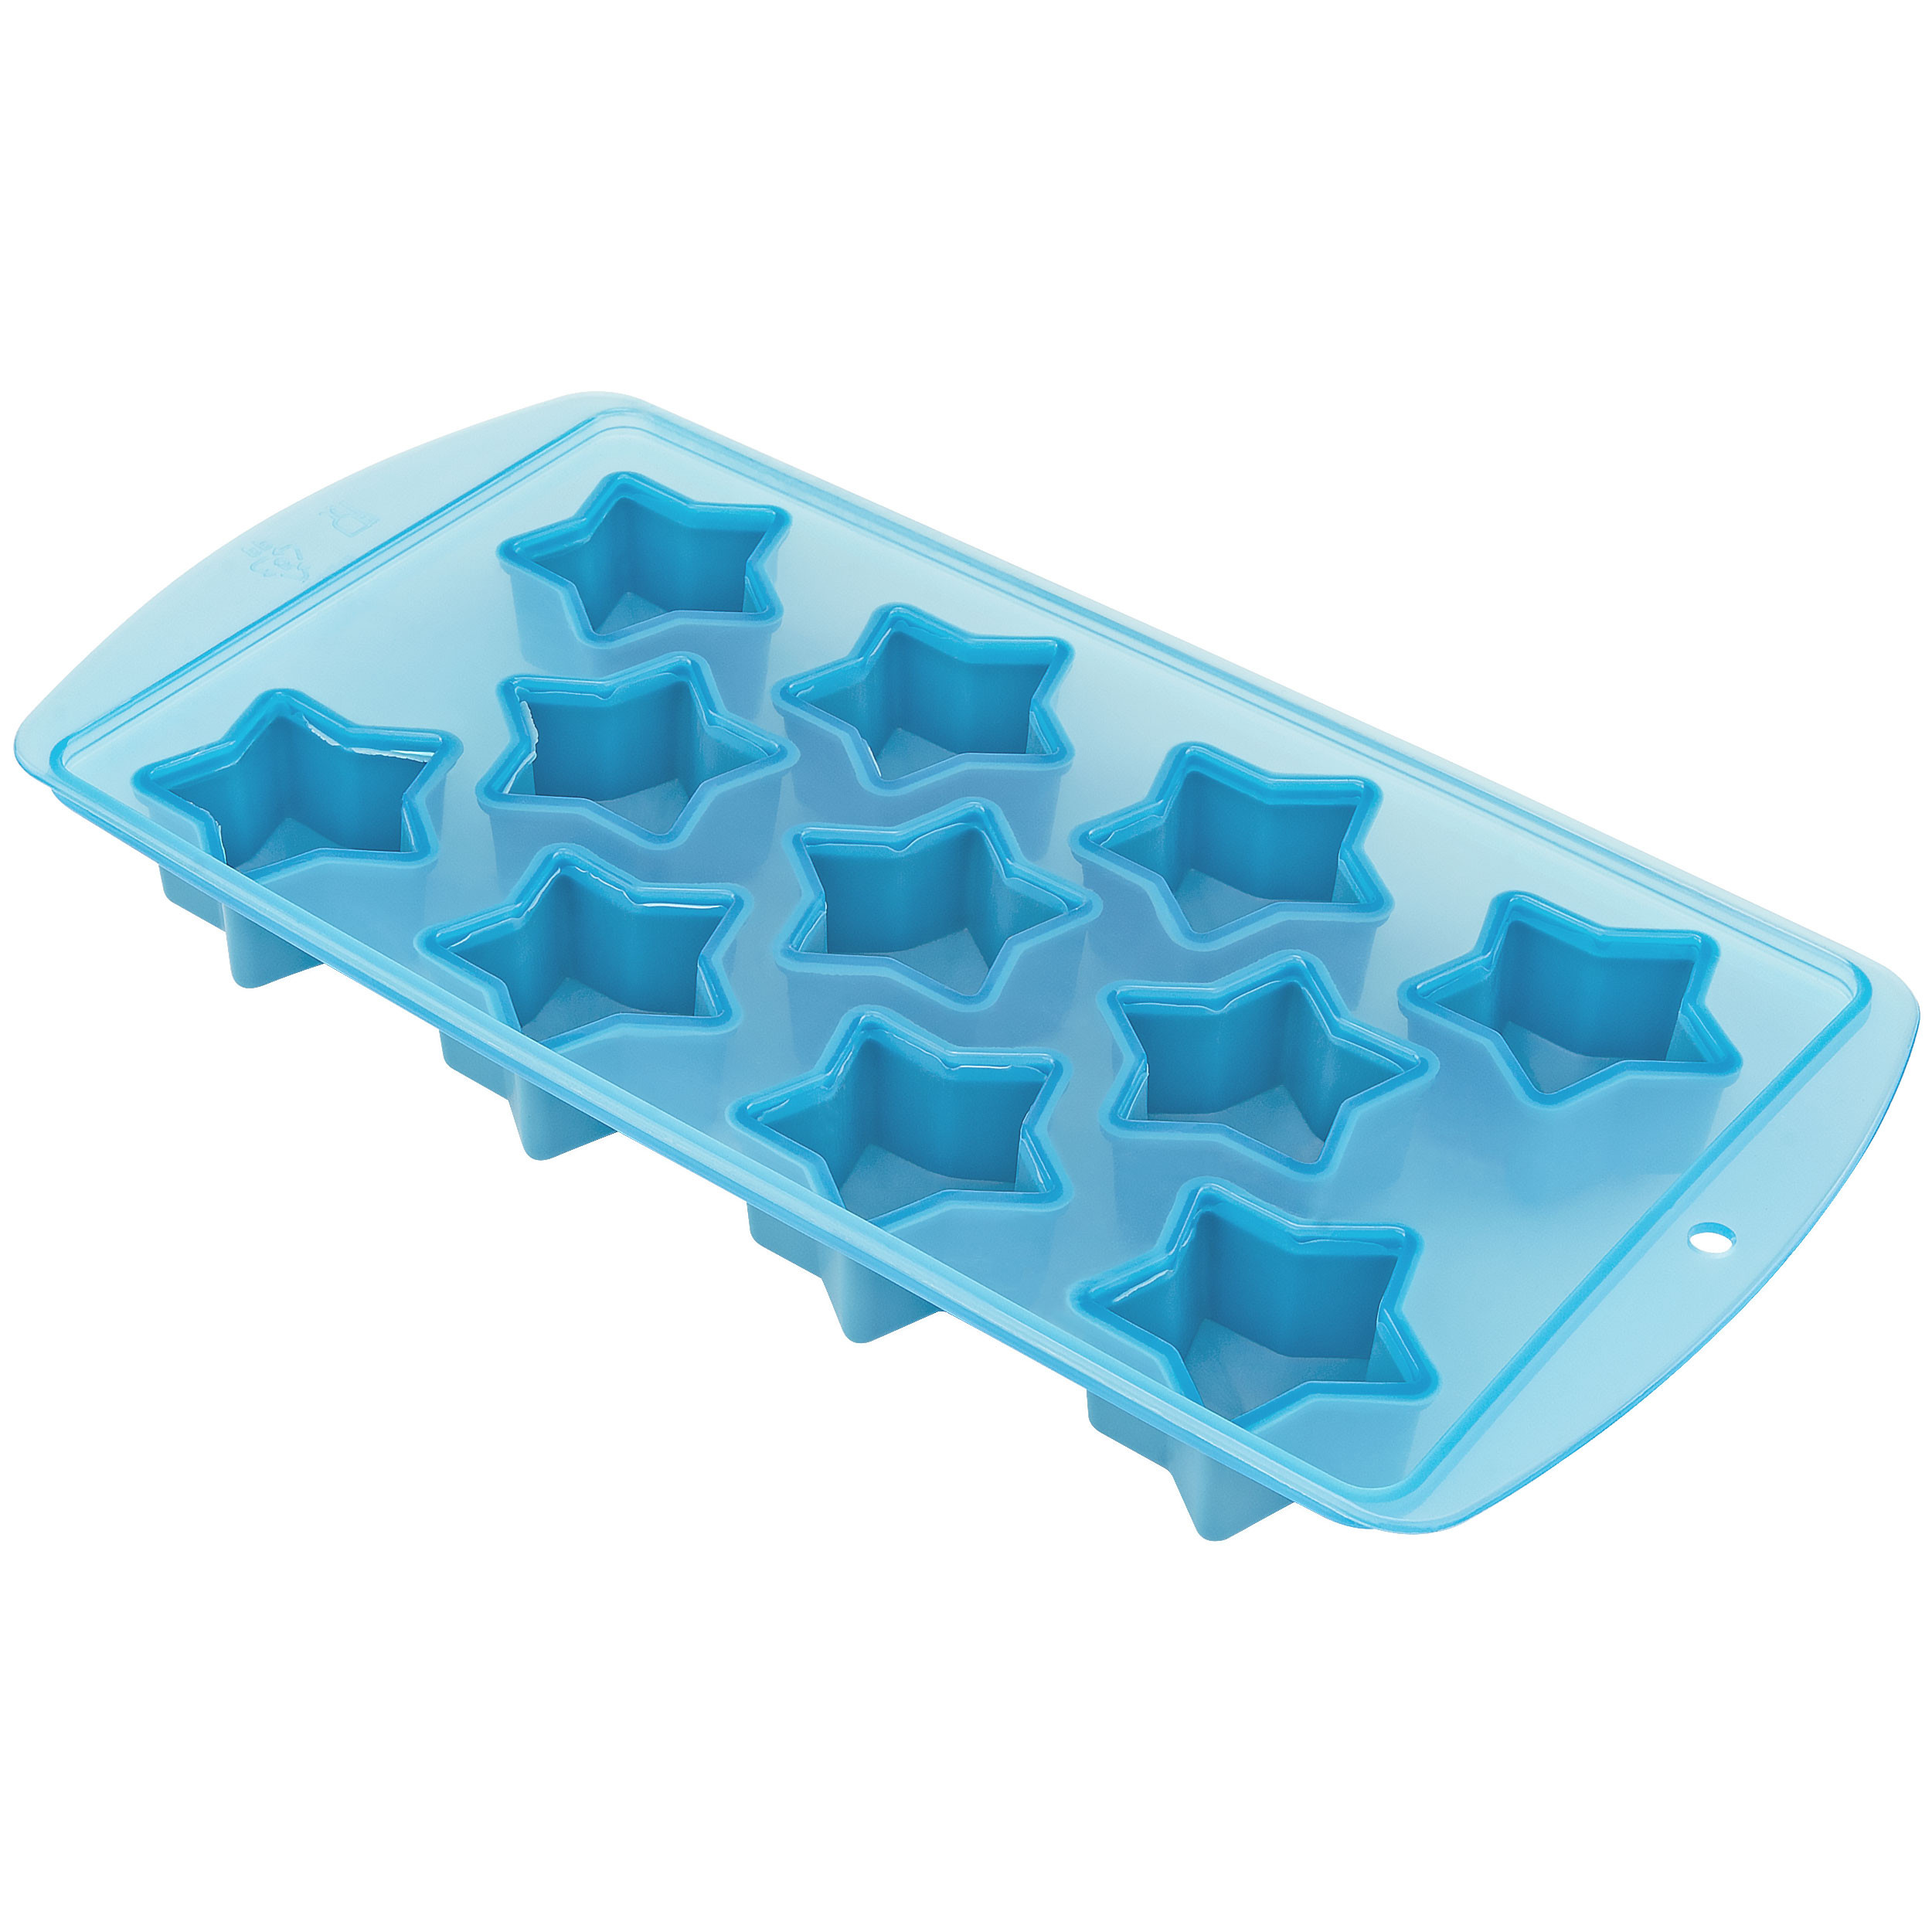 Fairly Odd Novelties FON-10006 Star Shape Flexible 11 Ice Cube Tray Mold Blue Rubber Novelty Gag Gift, One Size